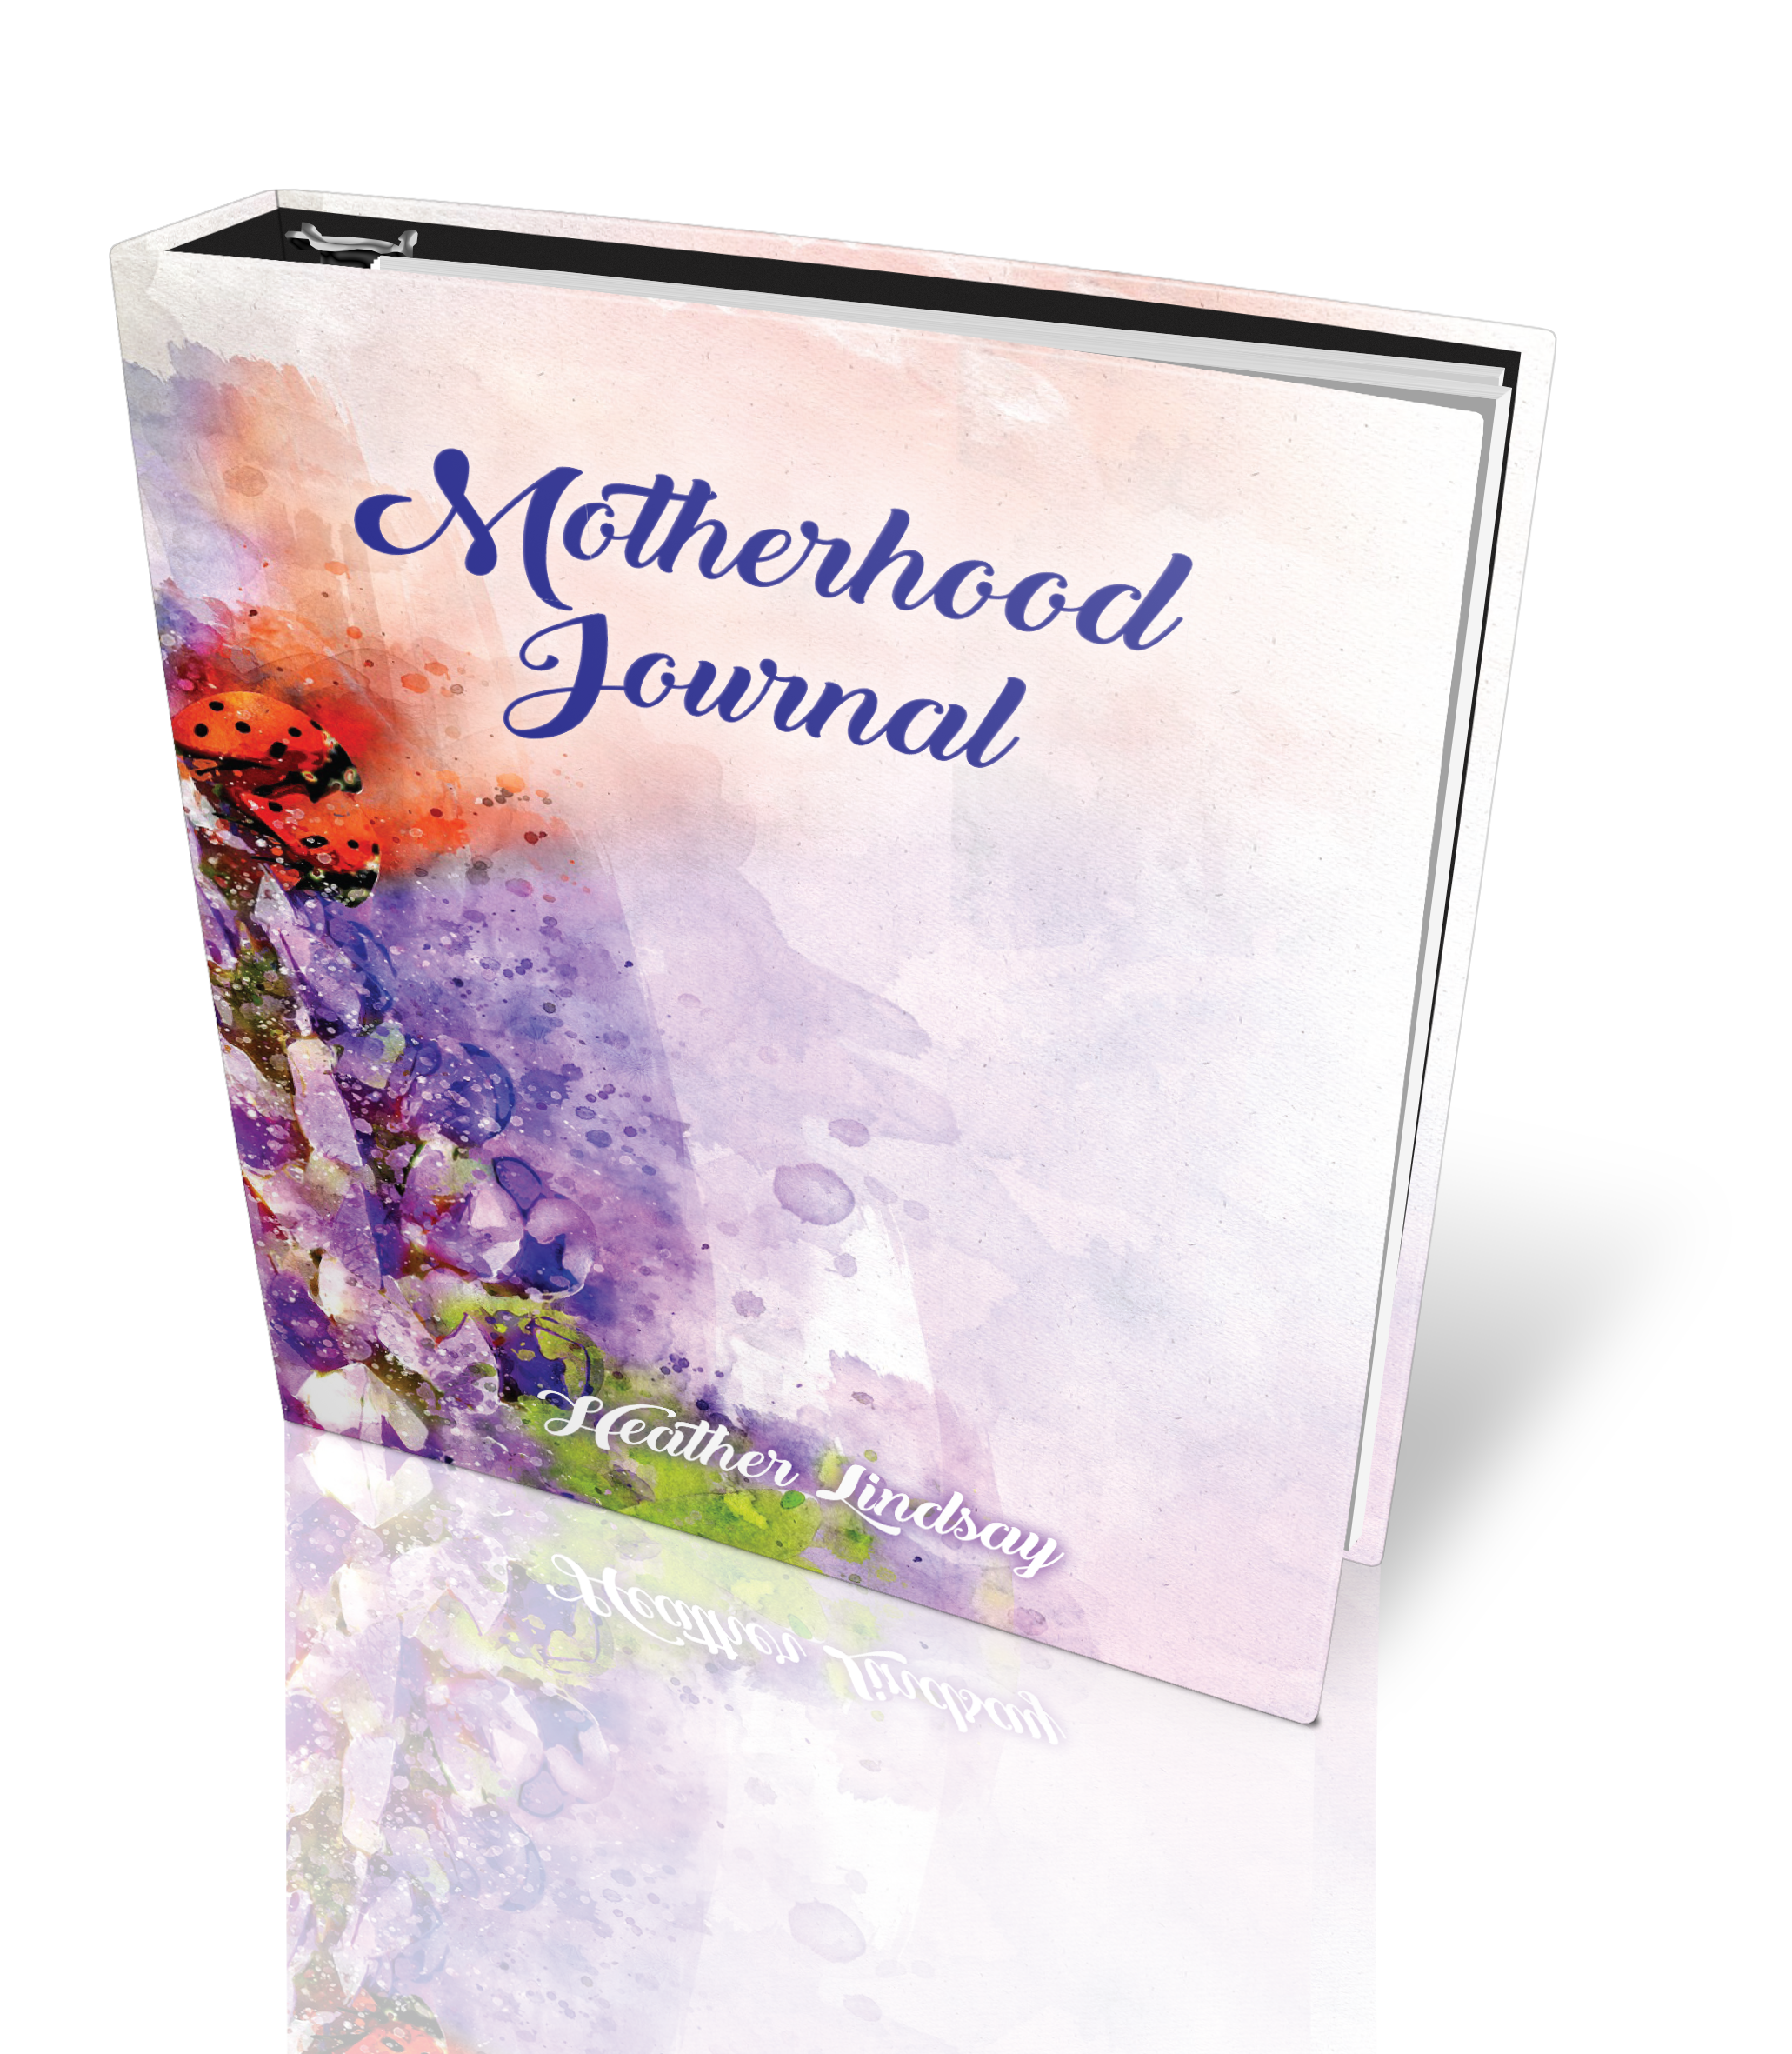 MotherhoodJournal front - Motherhood Journal Pre-Sale